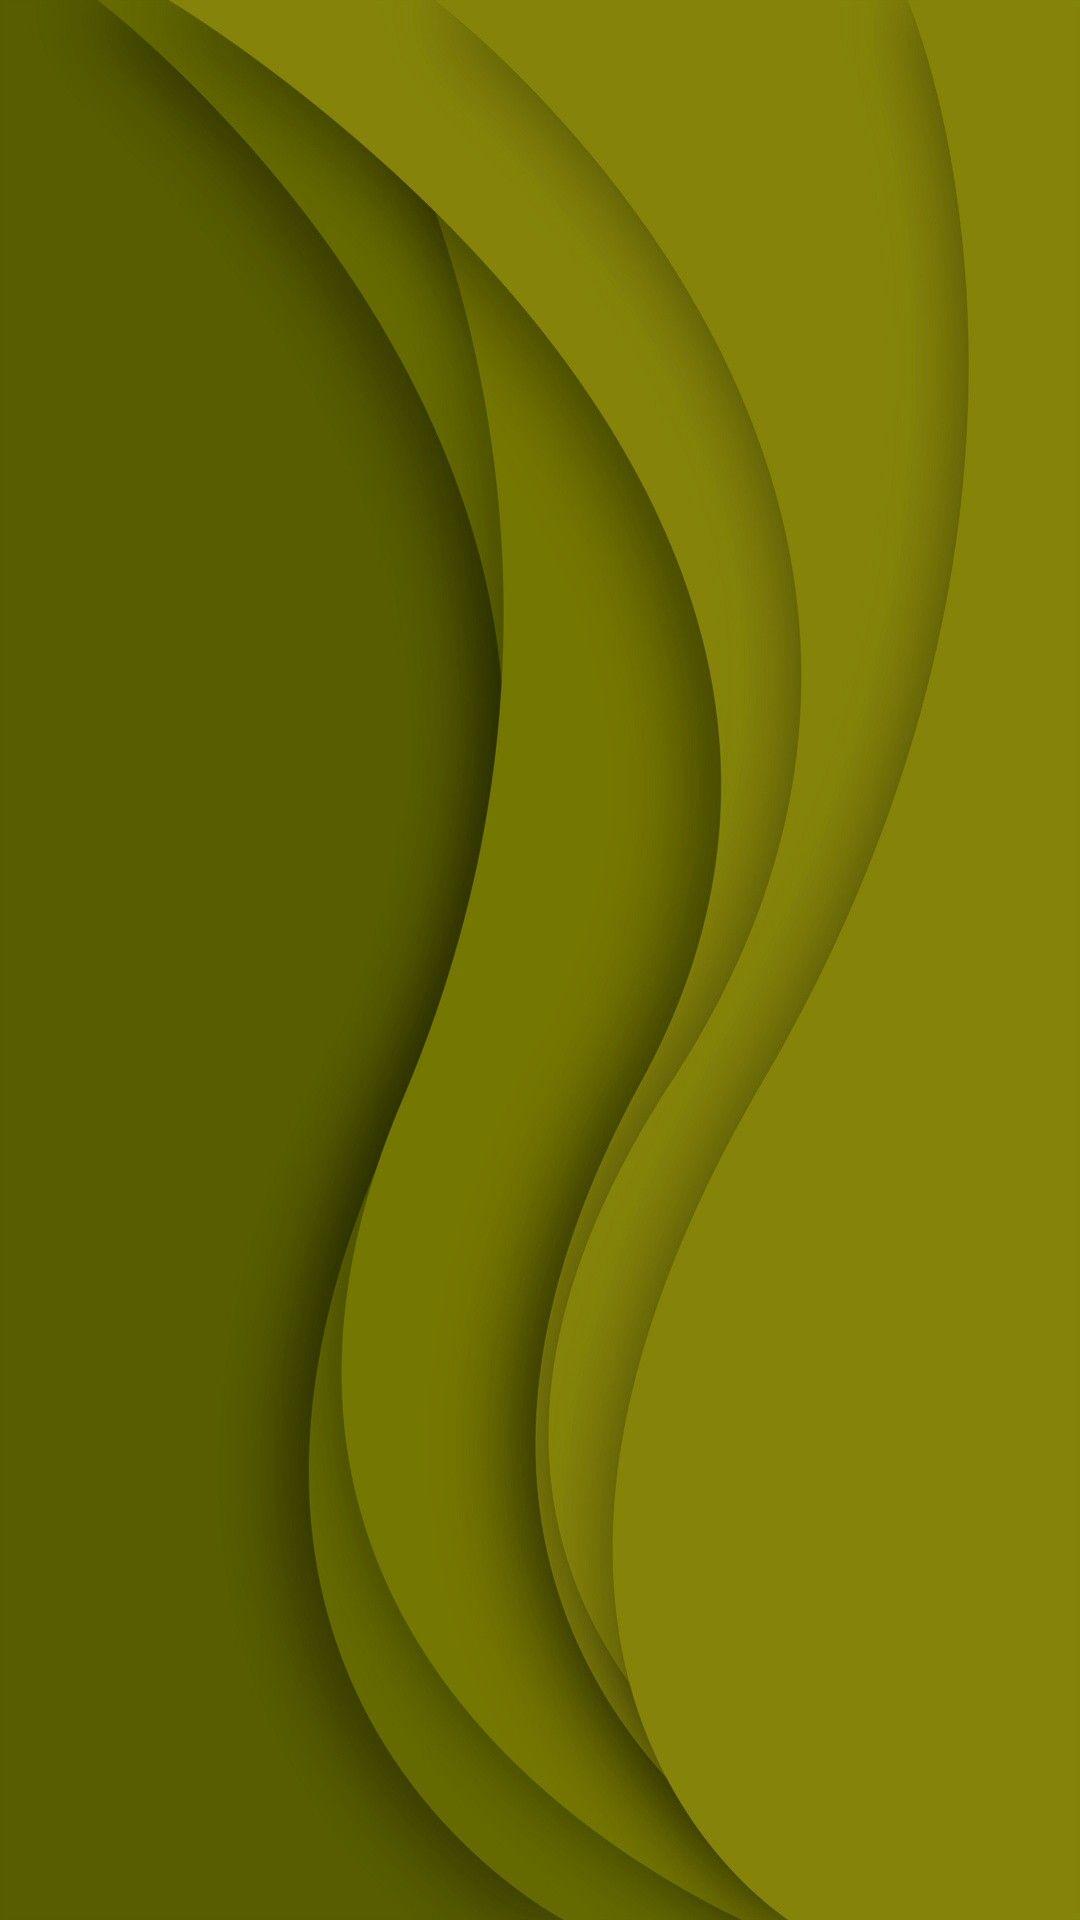 Minimal Olive Xperia Wallpaper Green Wallpaper Olive